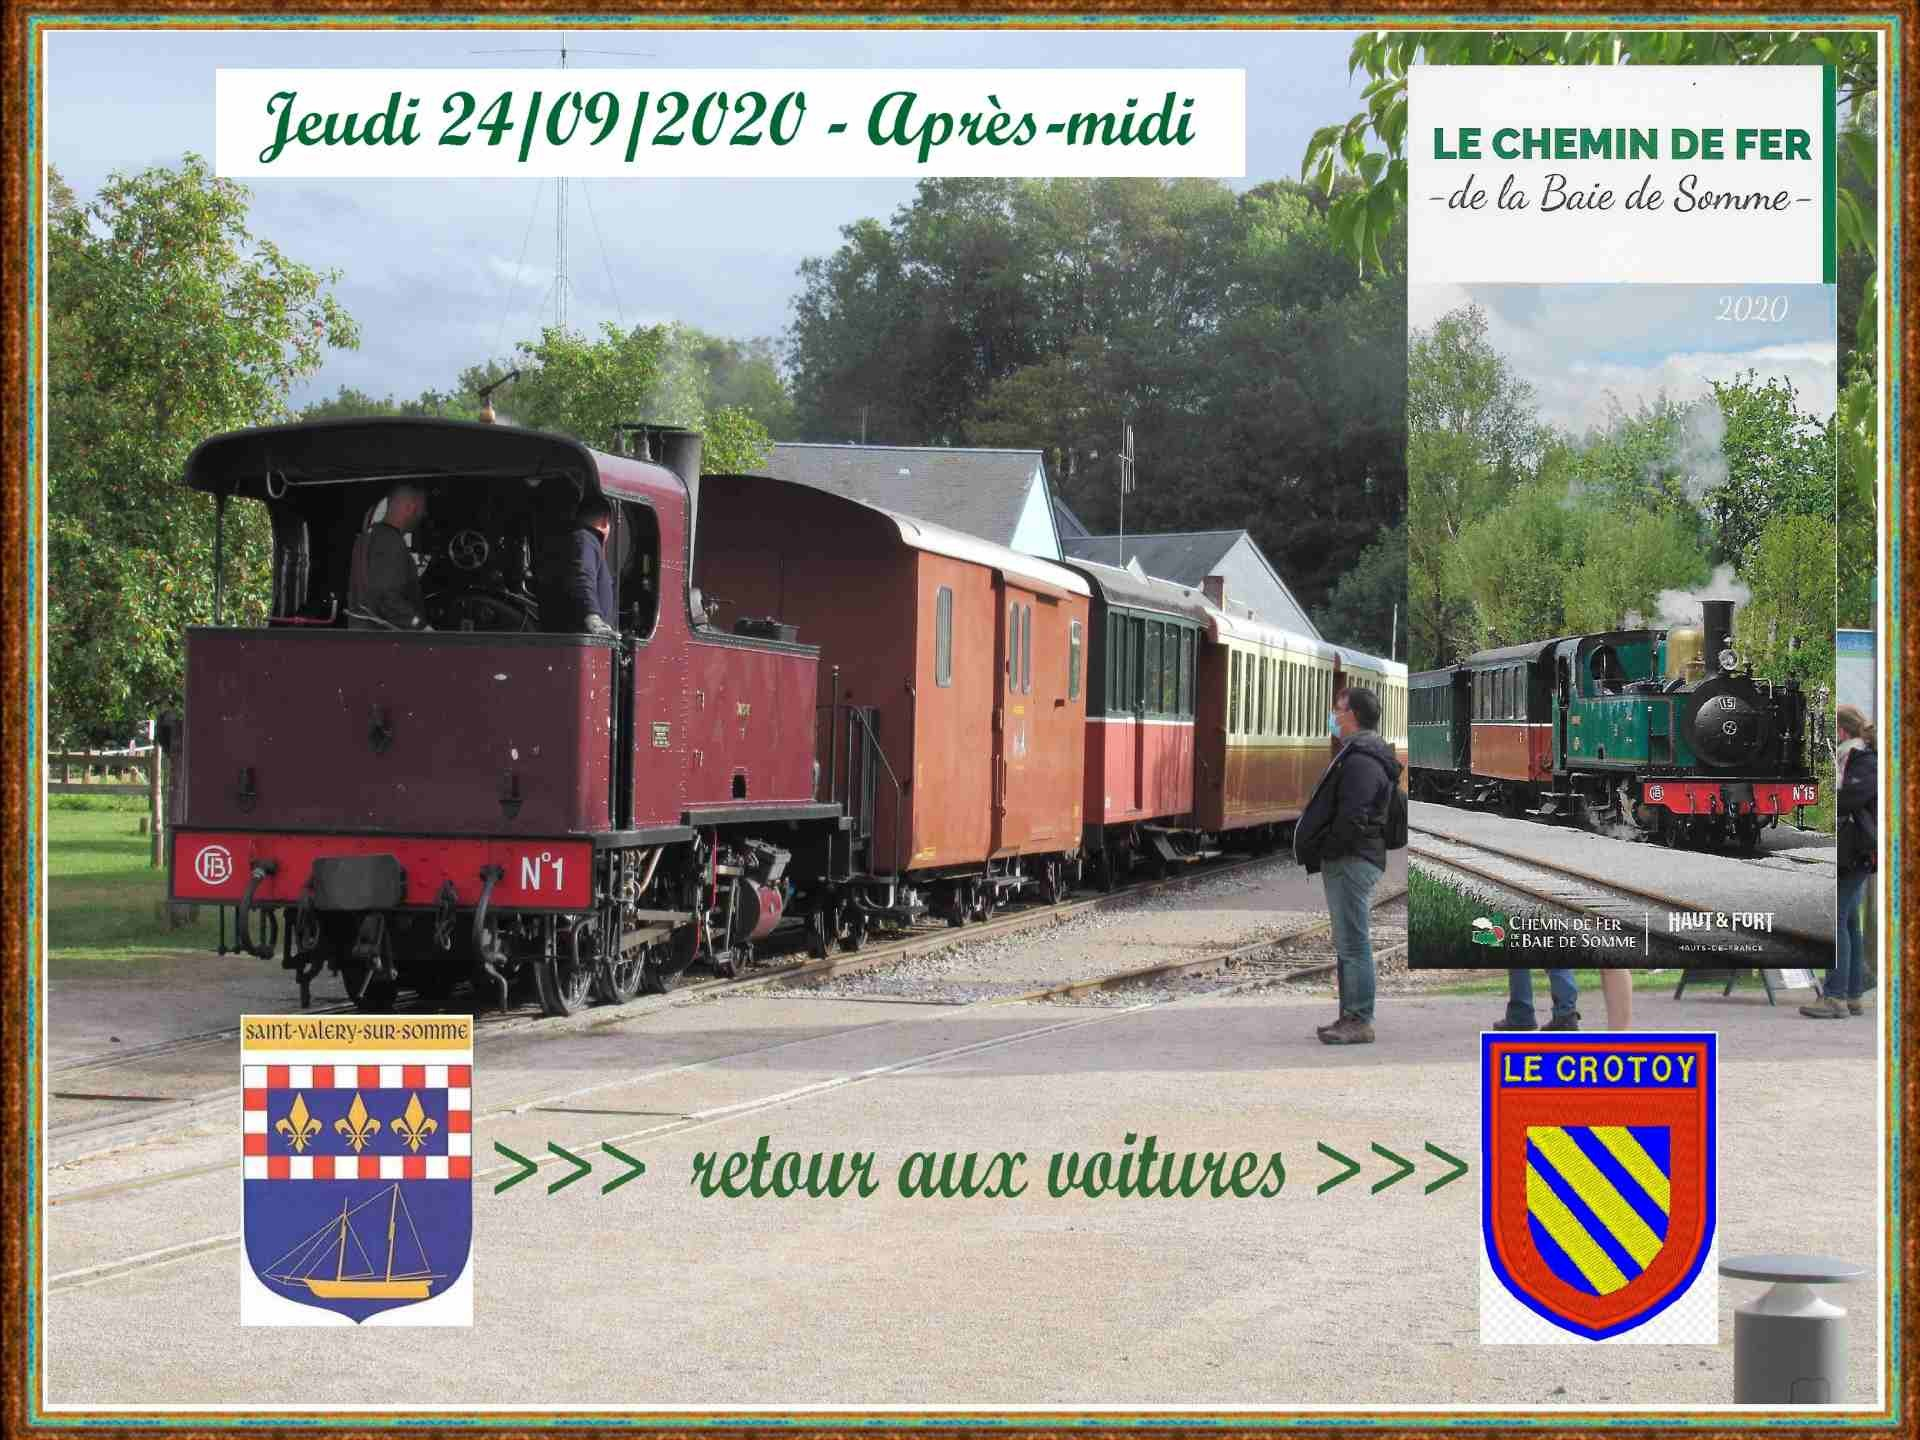 243 001 retour train